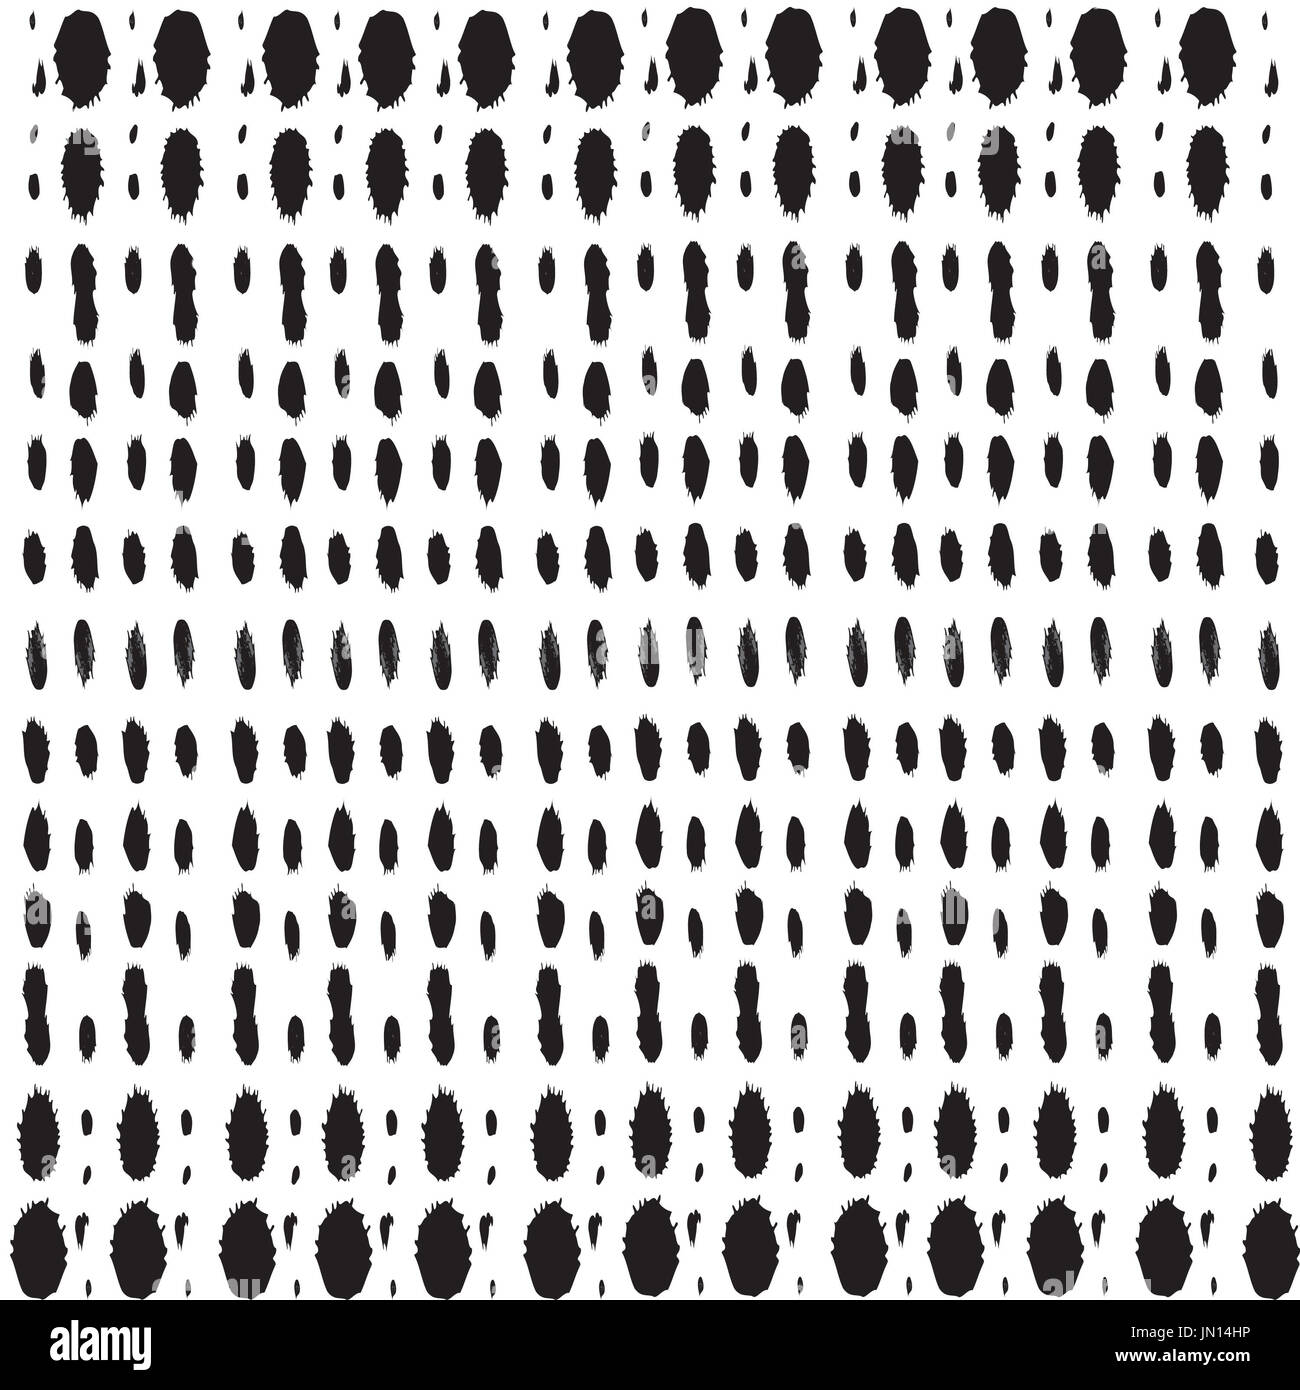 Resumen Antecedentes Dot Blot Geométrico Forrado Patrón Sin